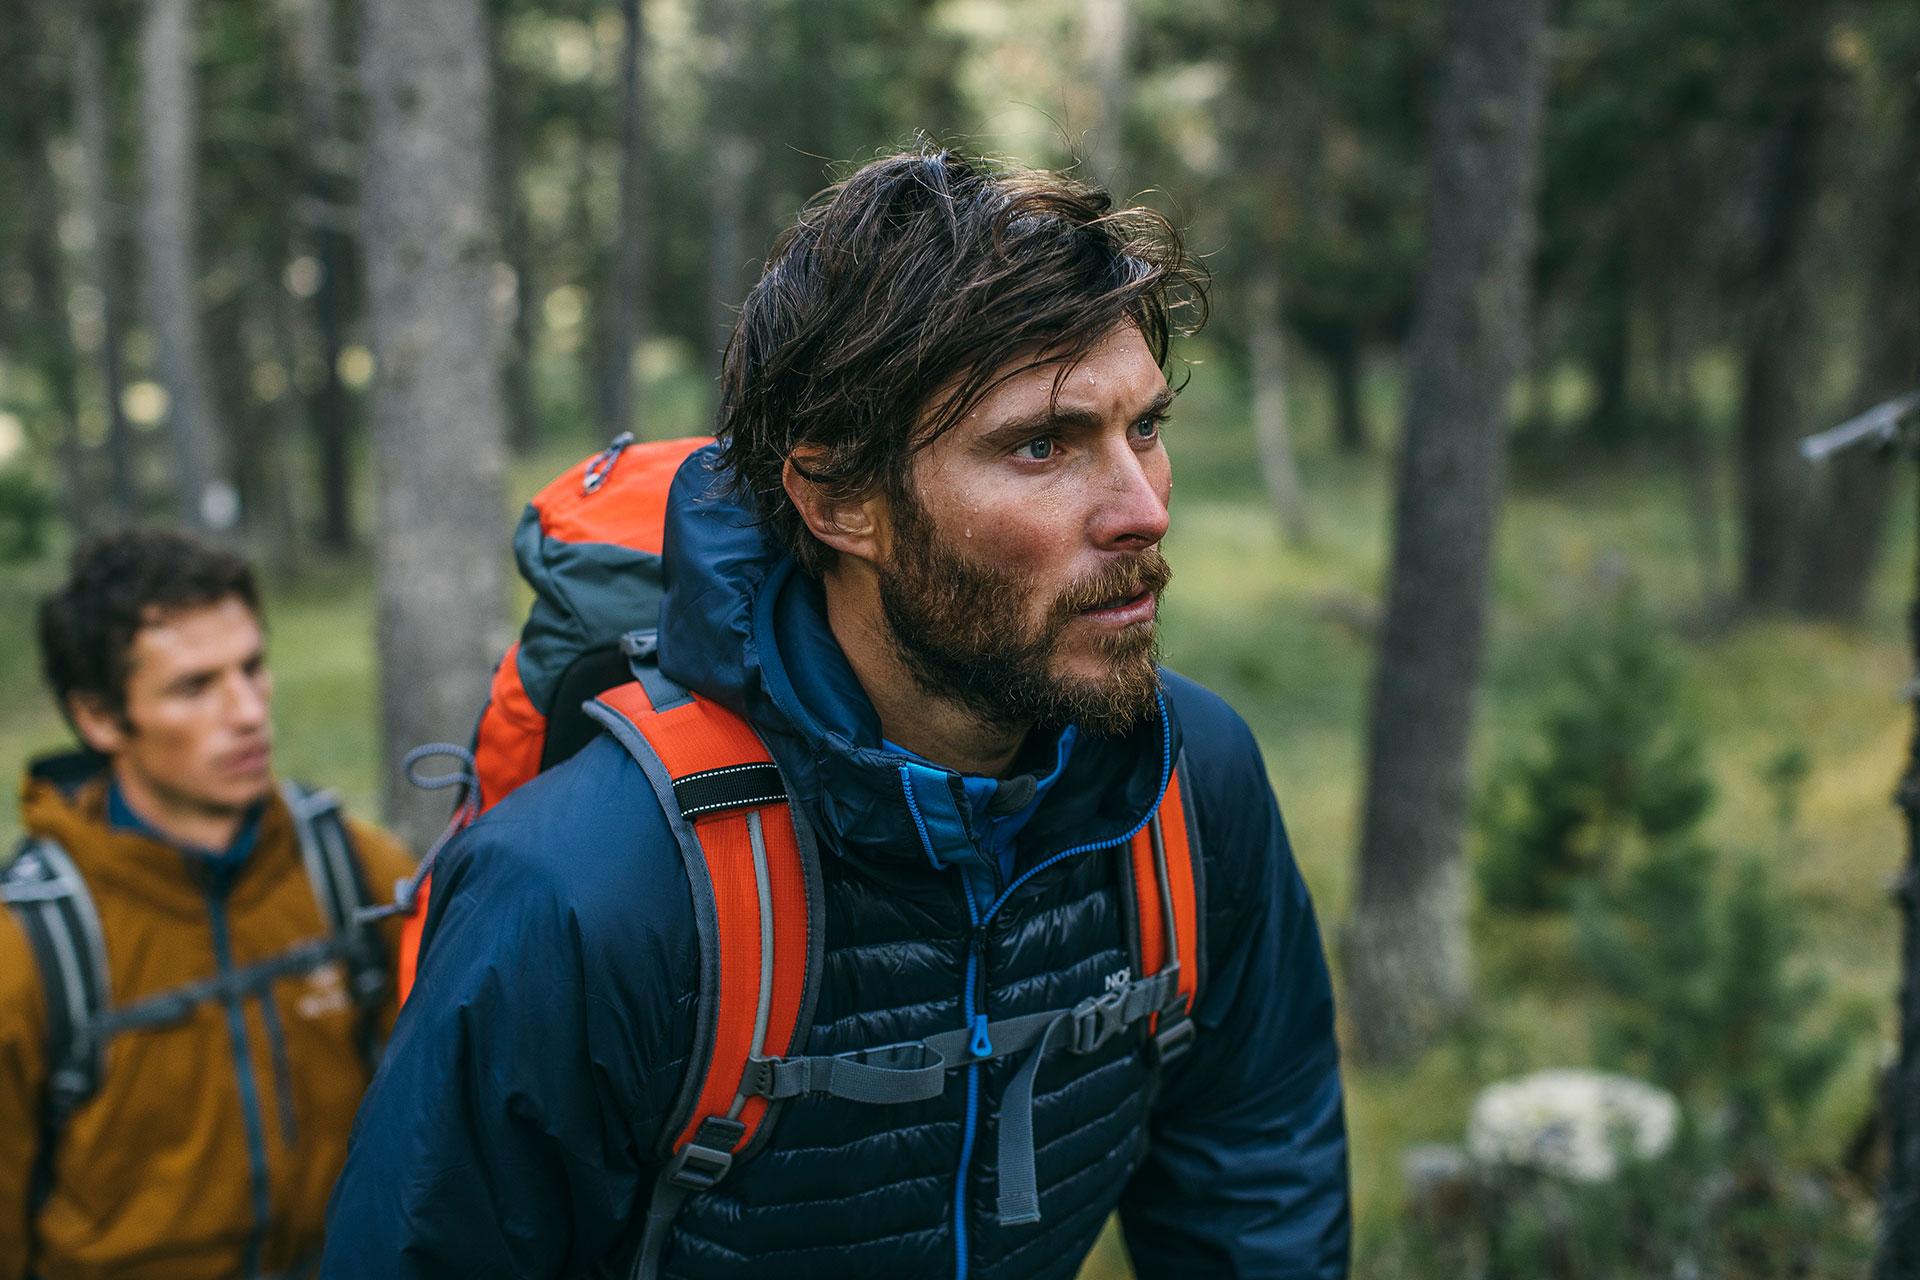 Portrait Outdoor Bekleidung Wandern Trekking Sport Katalog Micheal Müller Fotograf München